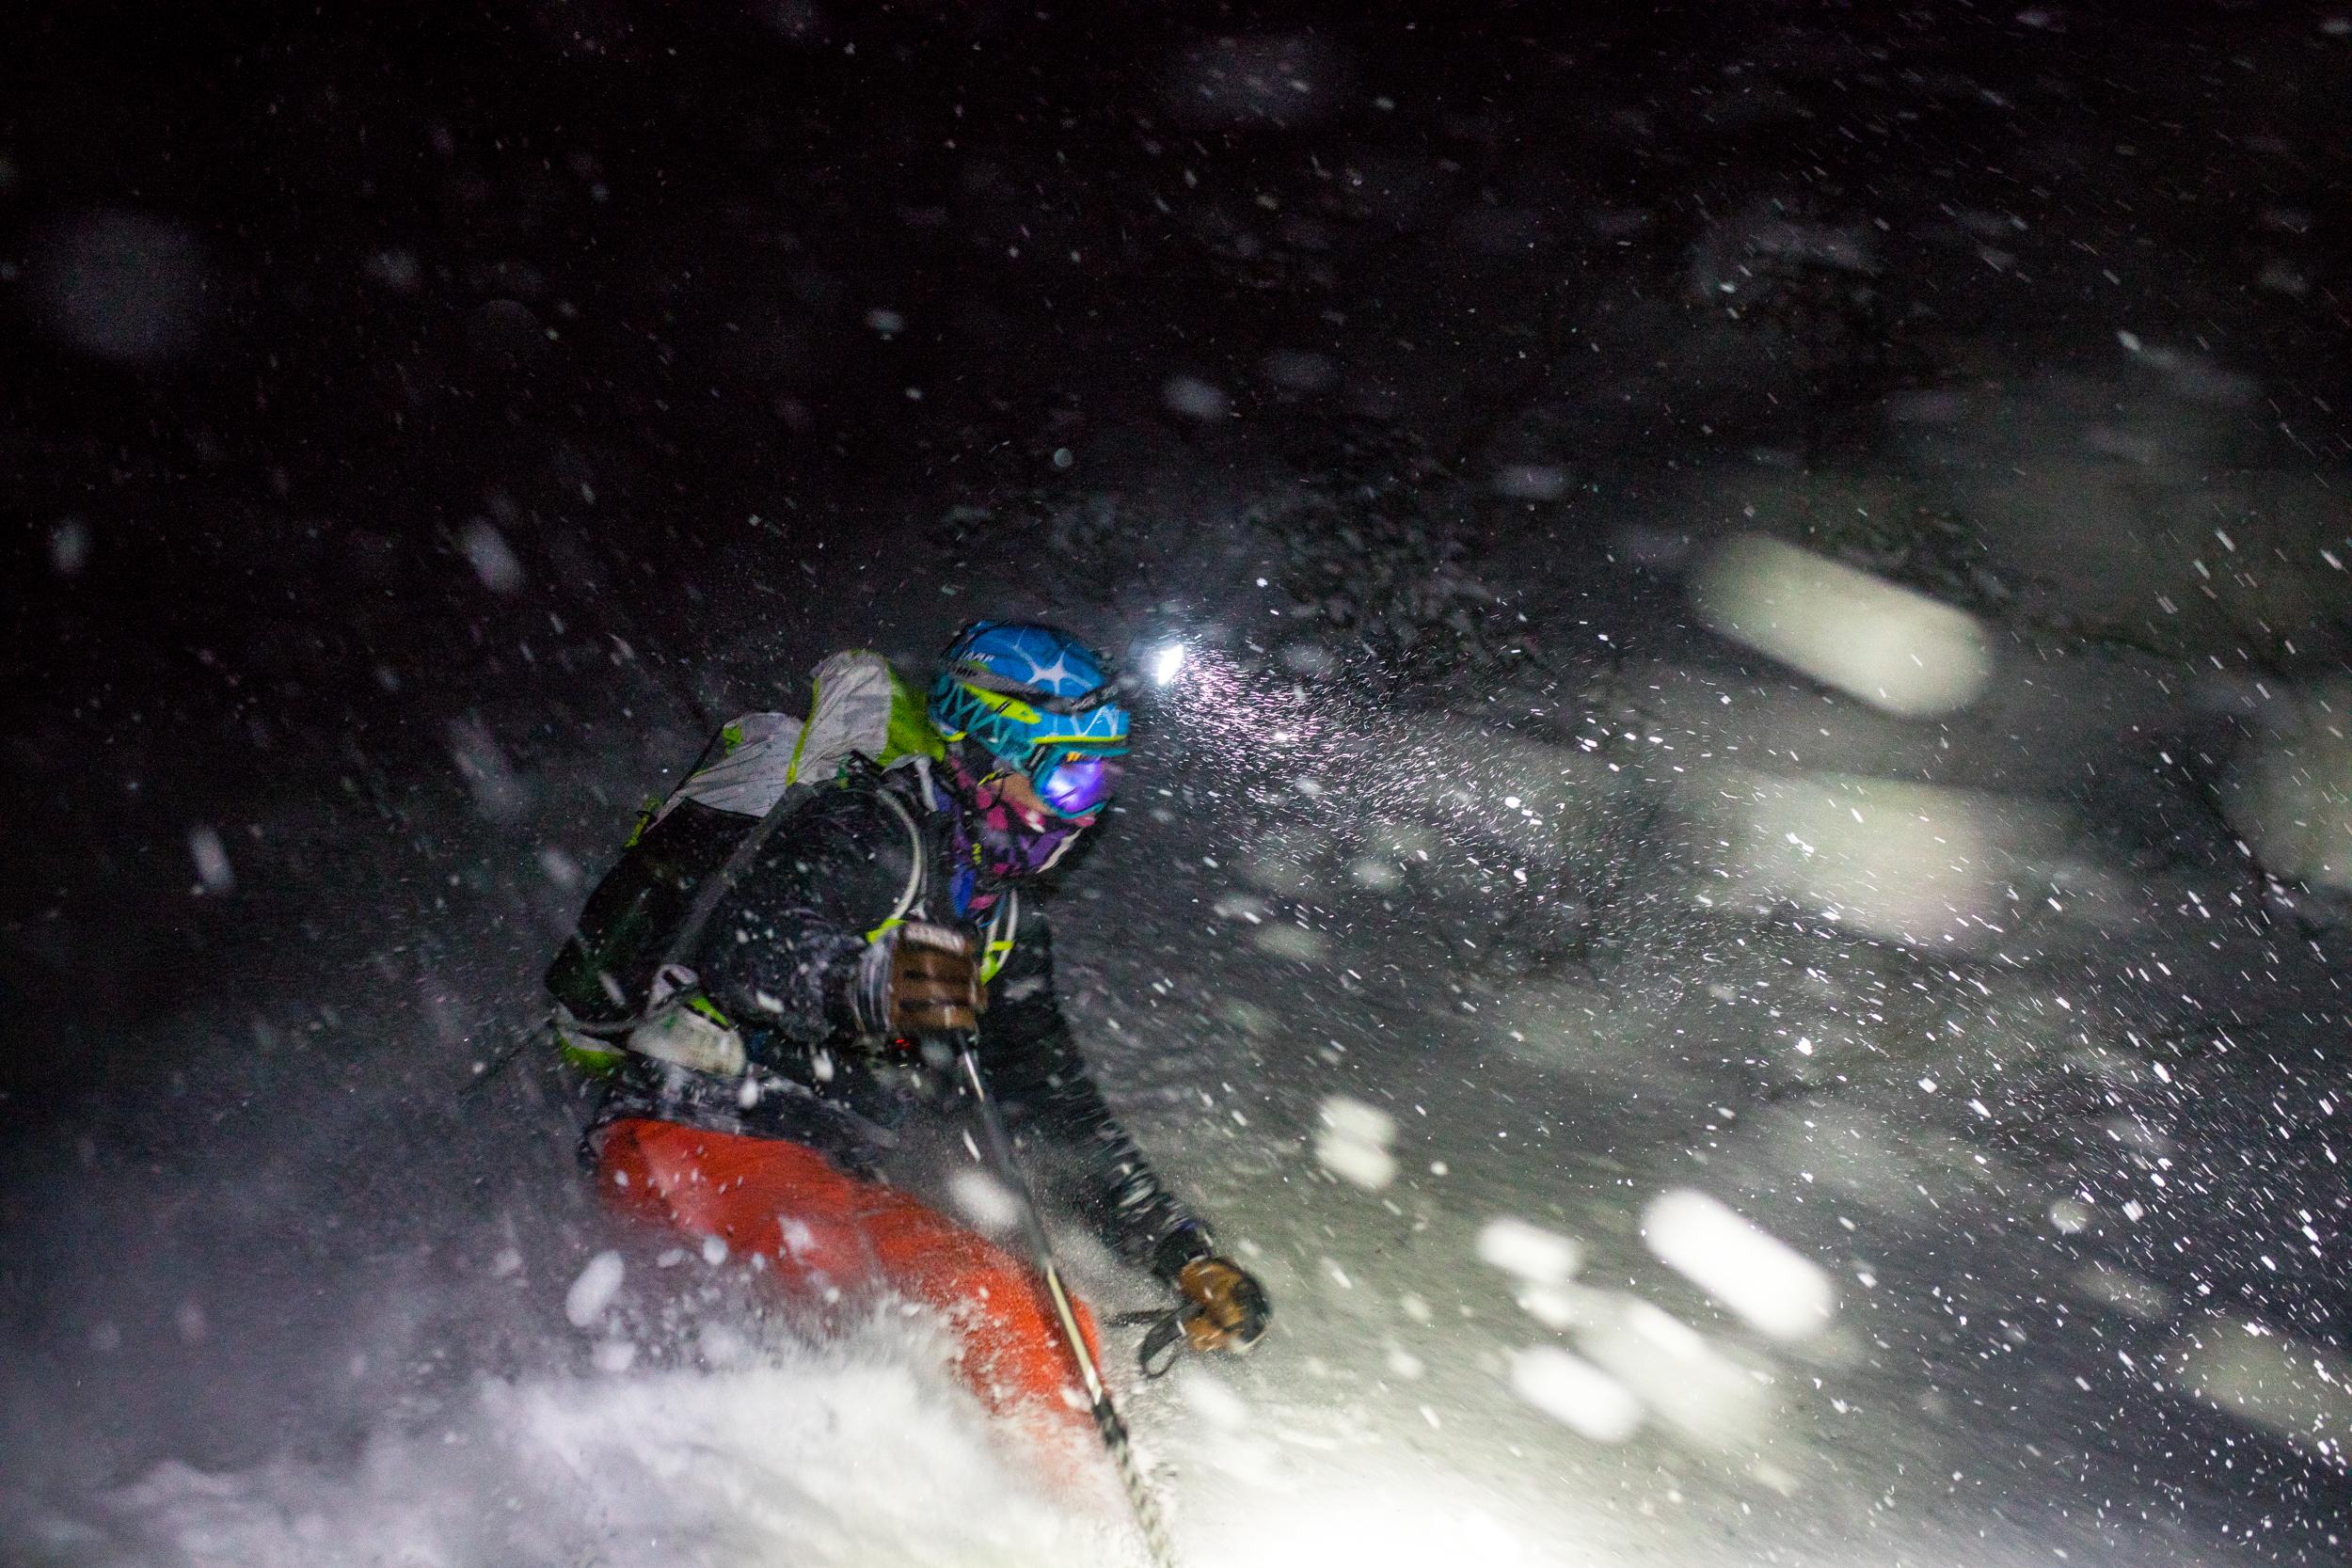 Alex Leich Night Skiing Gulf of Slides Ski Trail.jpg